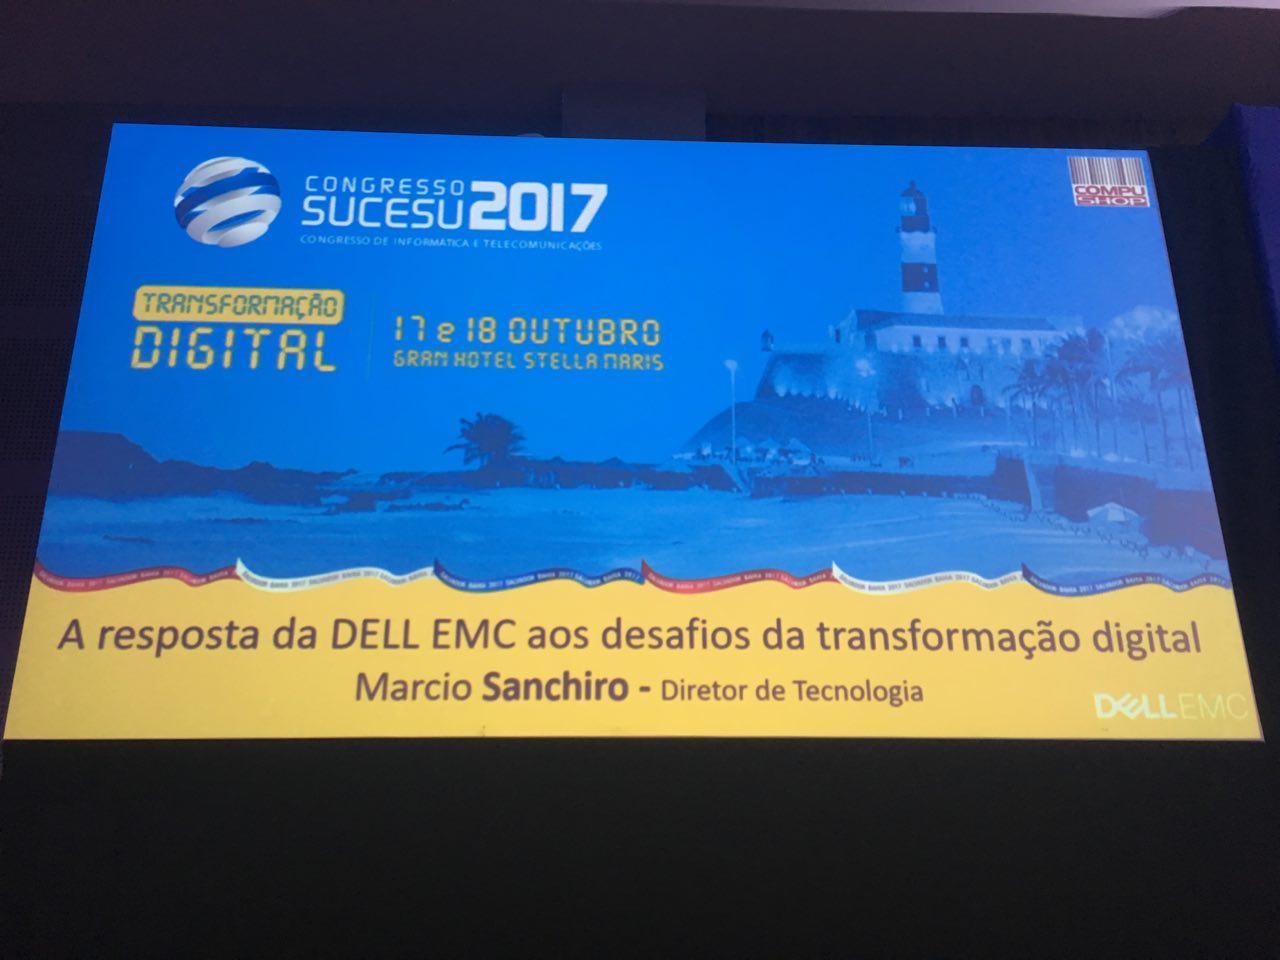 SUCESU Bahia 2017